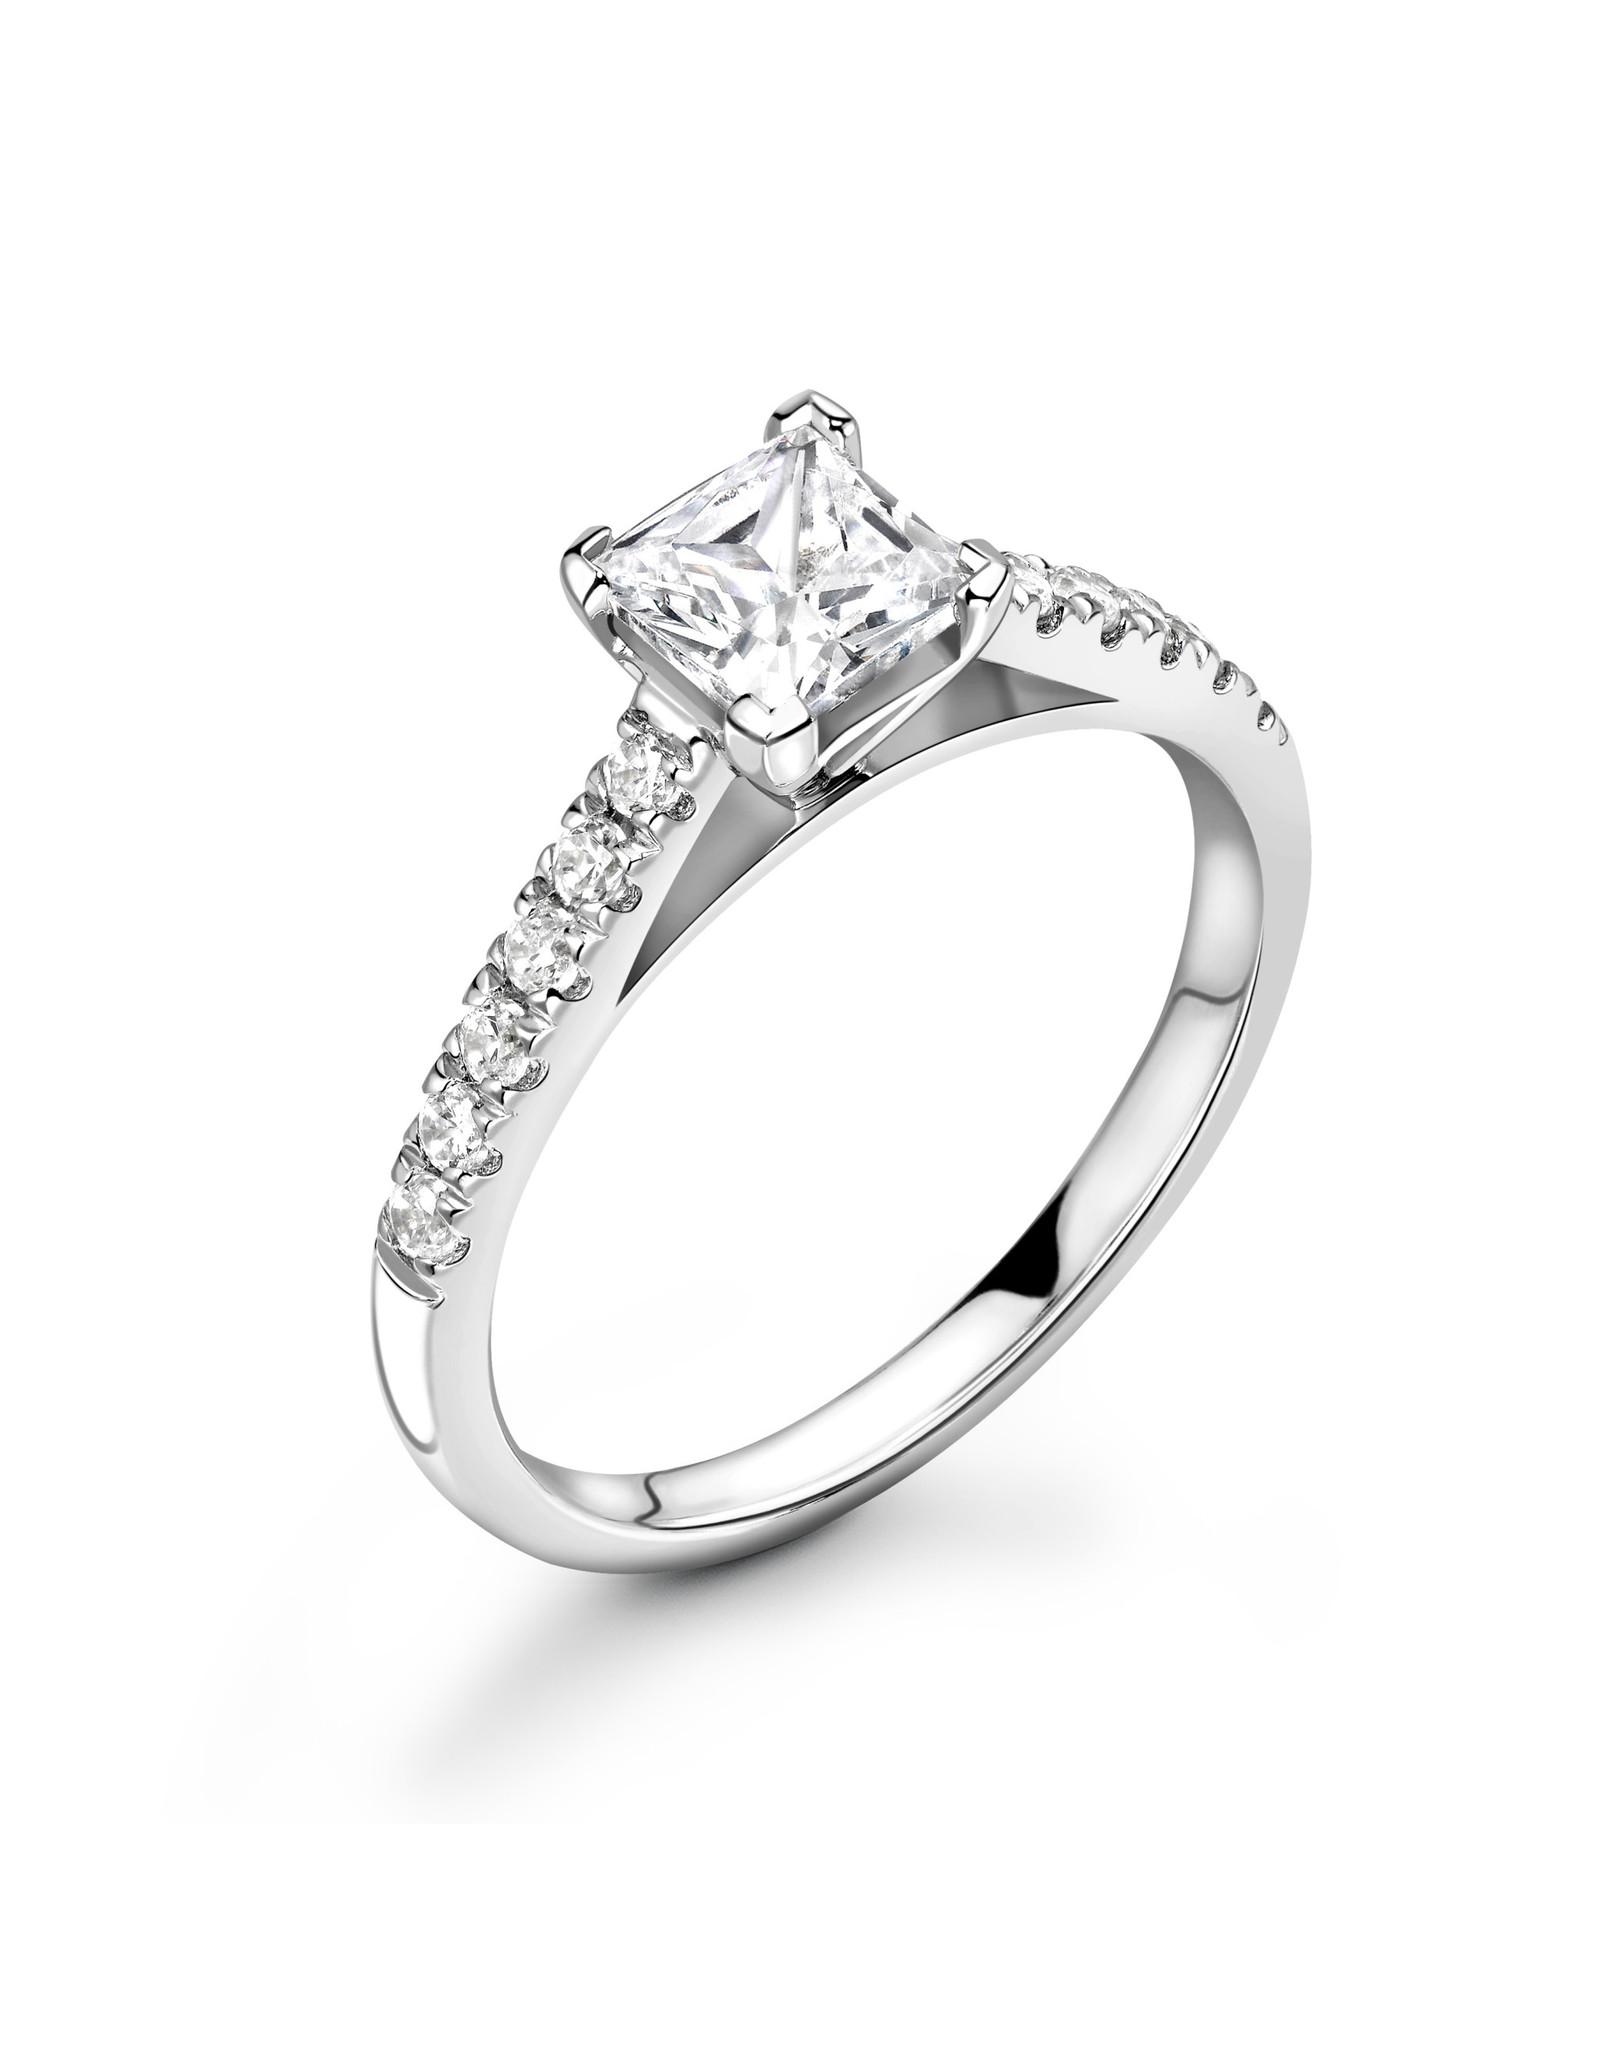 LVN Princesse Verlovingsring Met Zijsteentjes LVNRX5356